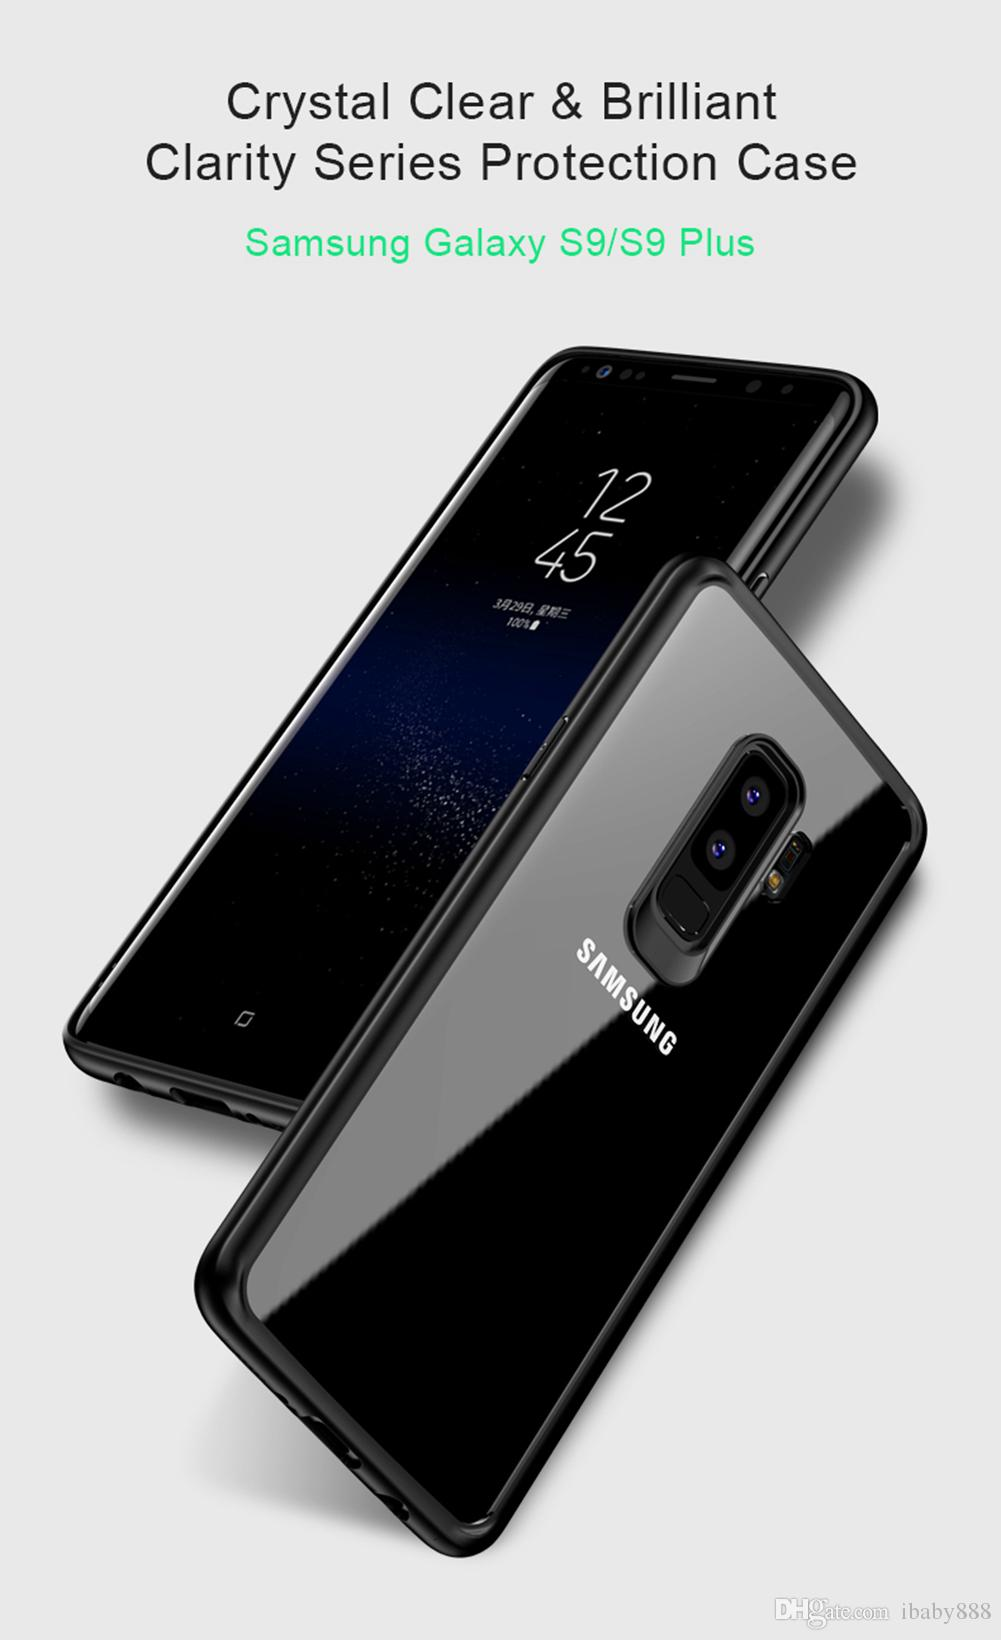 Contraportada transparente transparente para PC de Crystal Clear HD con silicona suave TPU Parachoques Anti-huellas dactilares antiarañazos para Galaxy S9 + iPhone X 8 Plus